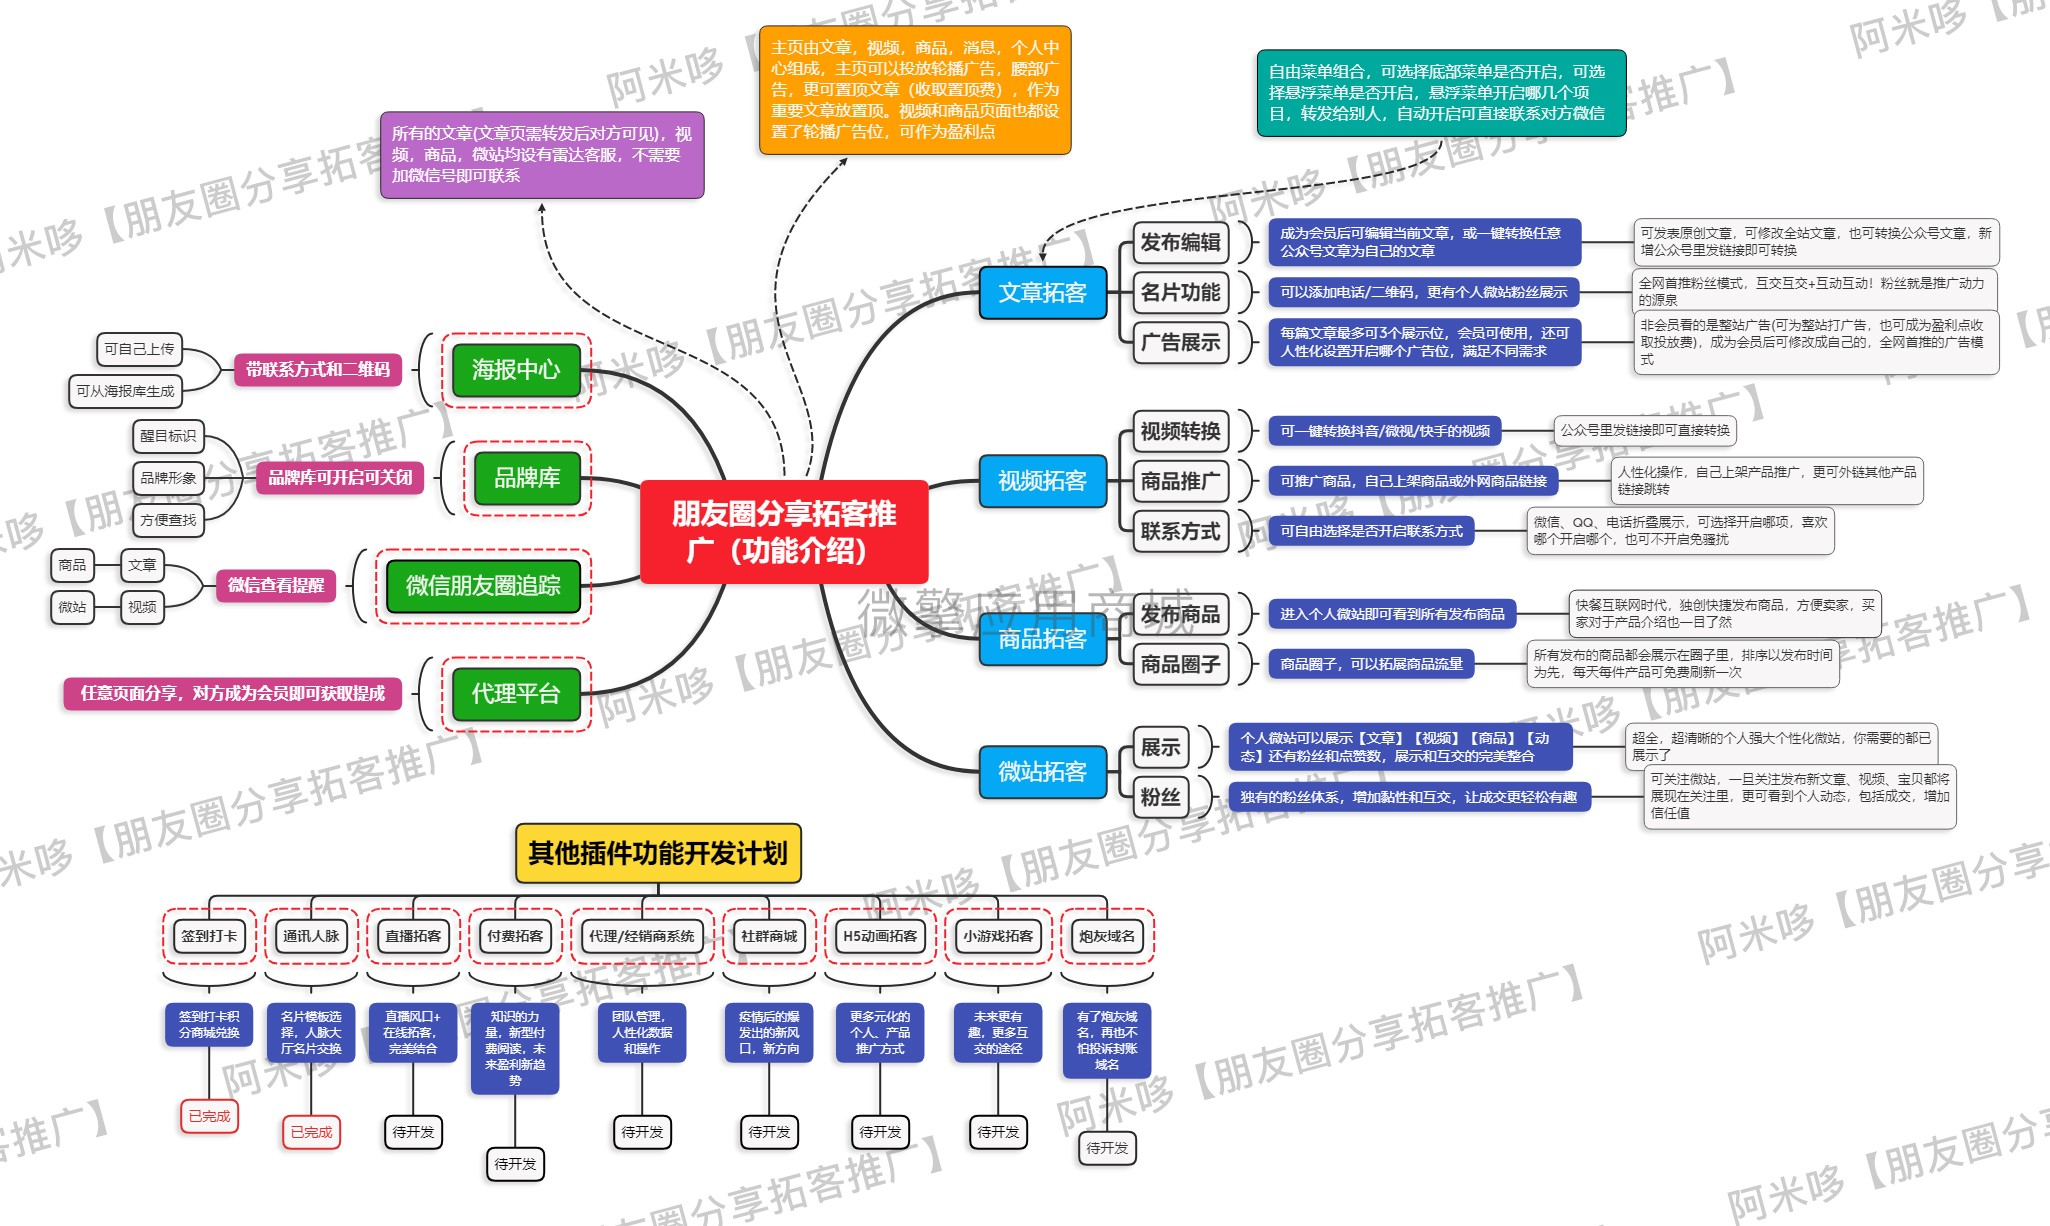 wq模块朋友圈分享拓客推广5.4.7-渔枫网络资源网